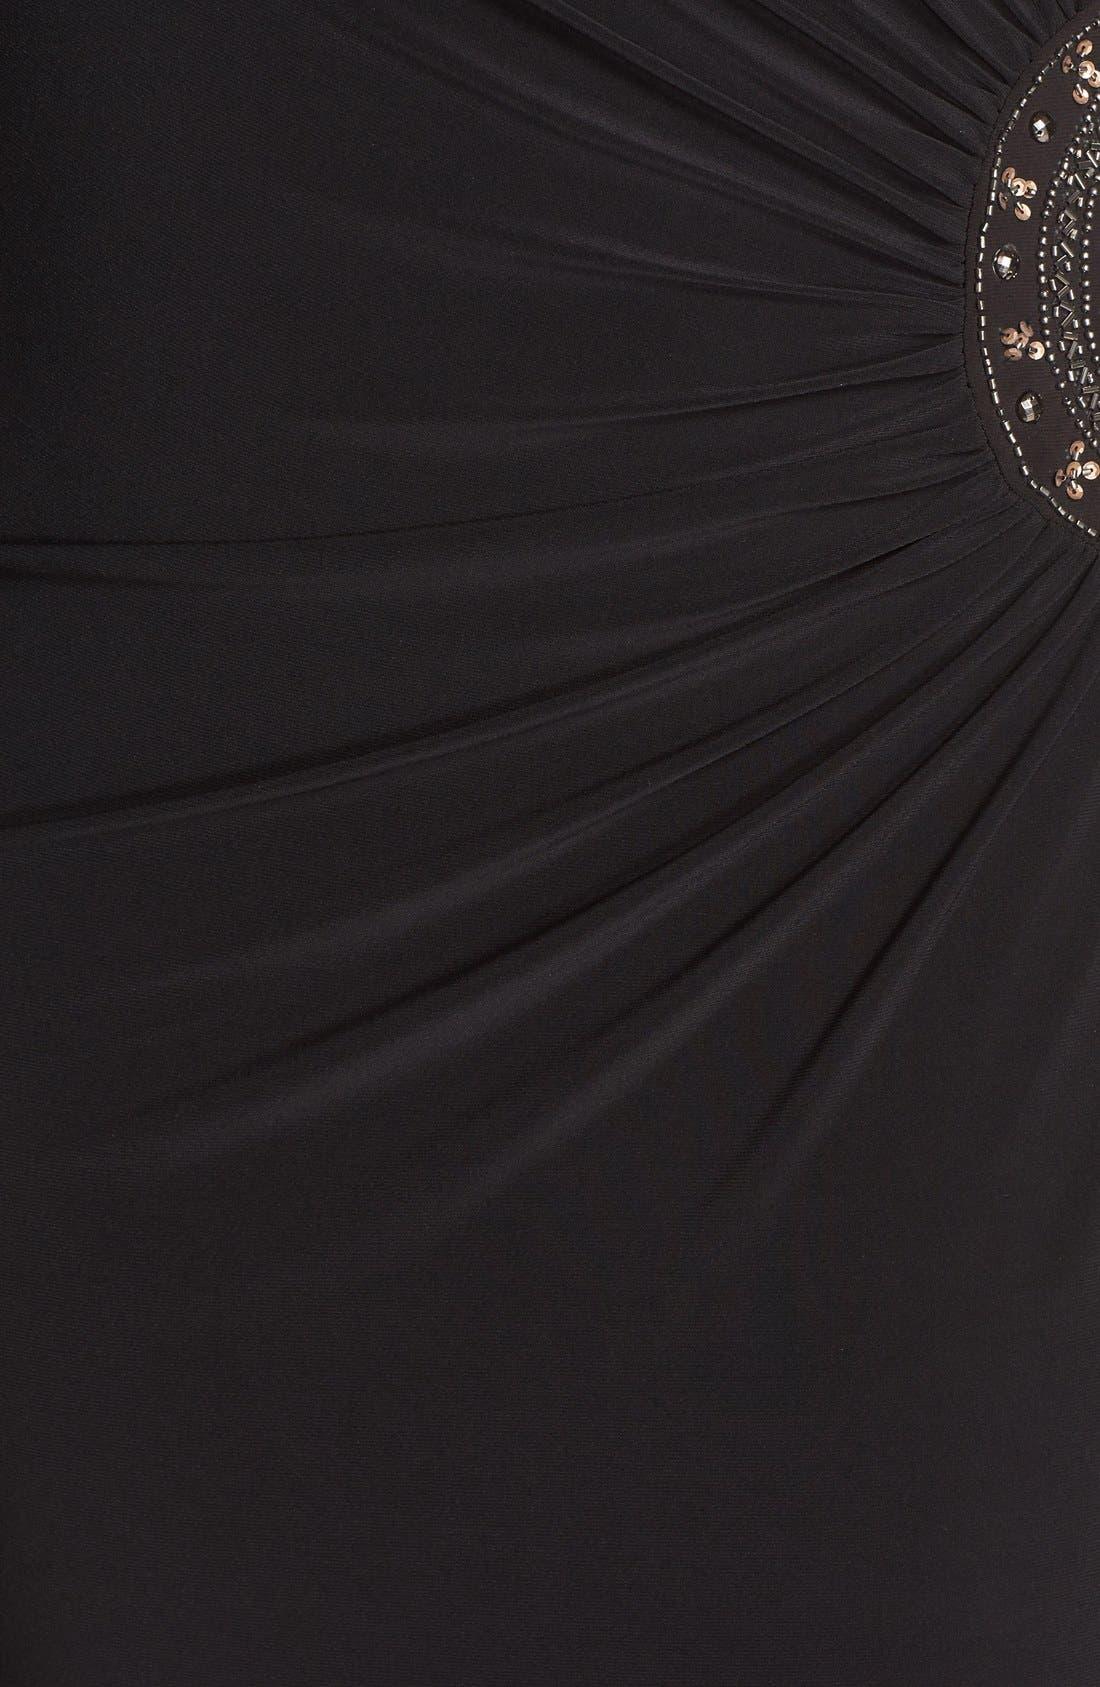 Embellished Stretch Jersey Long Dress,                             Alternate thumbnail 6, color,                             BLACK/ GOLD